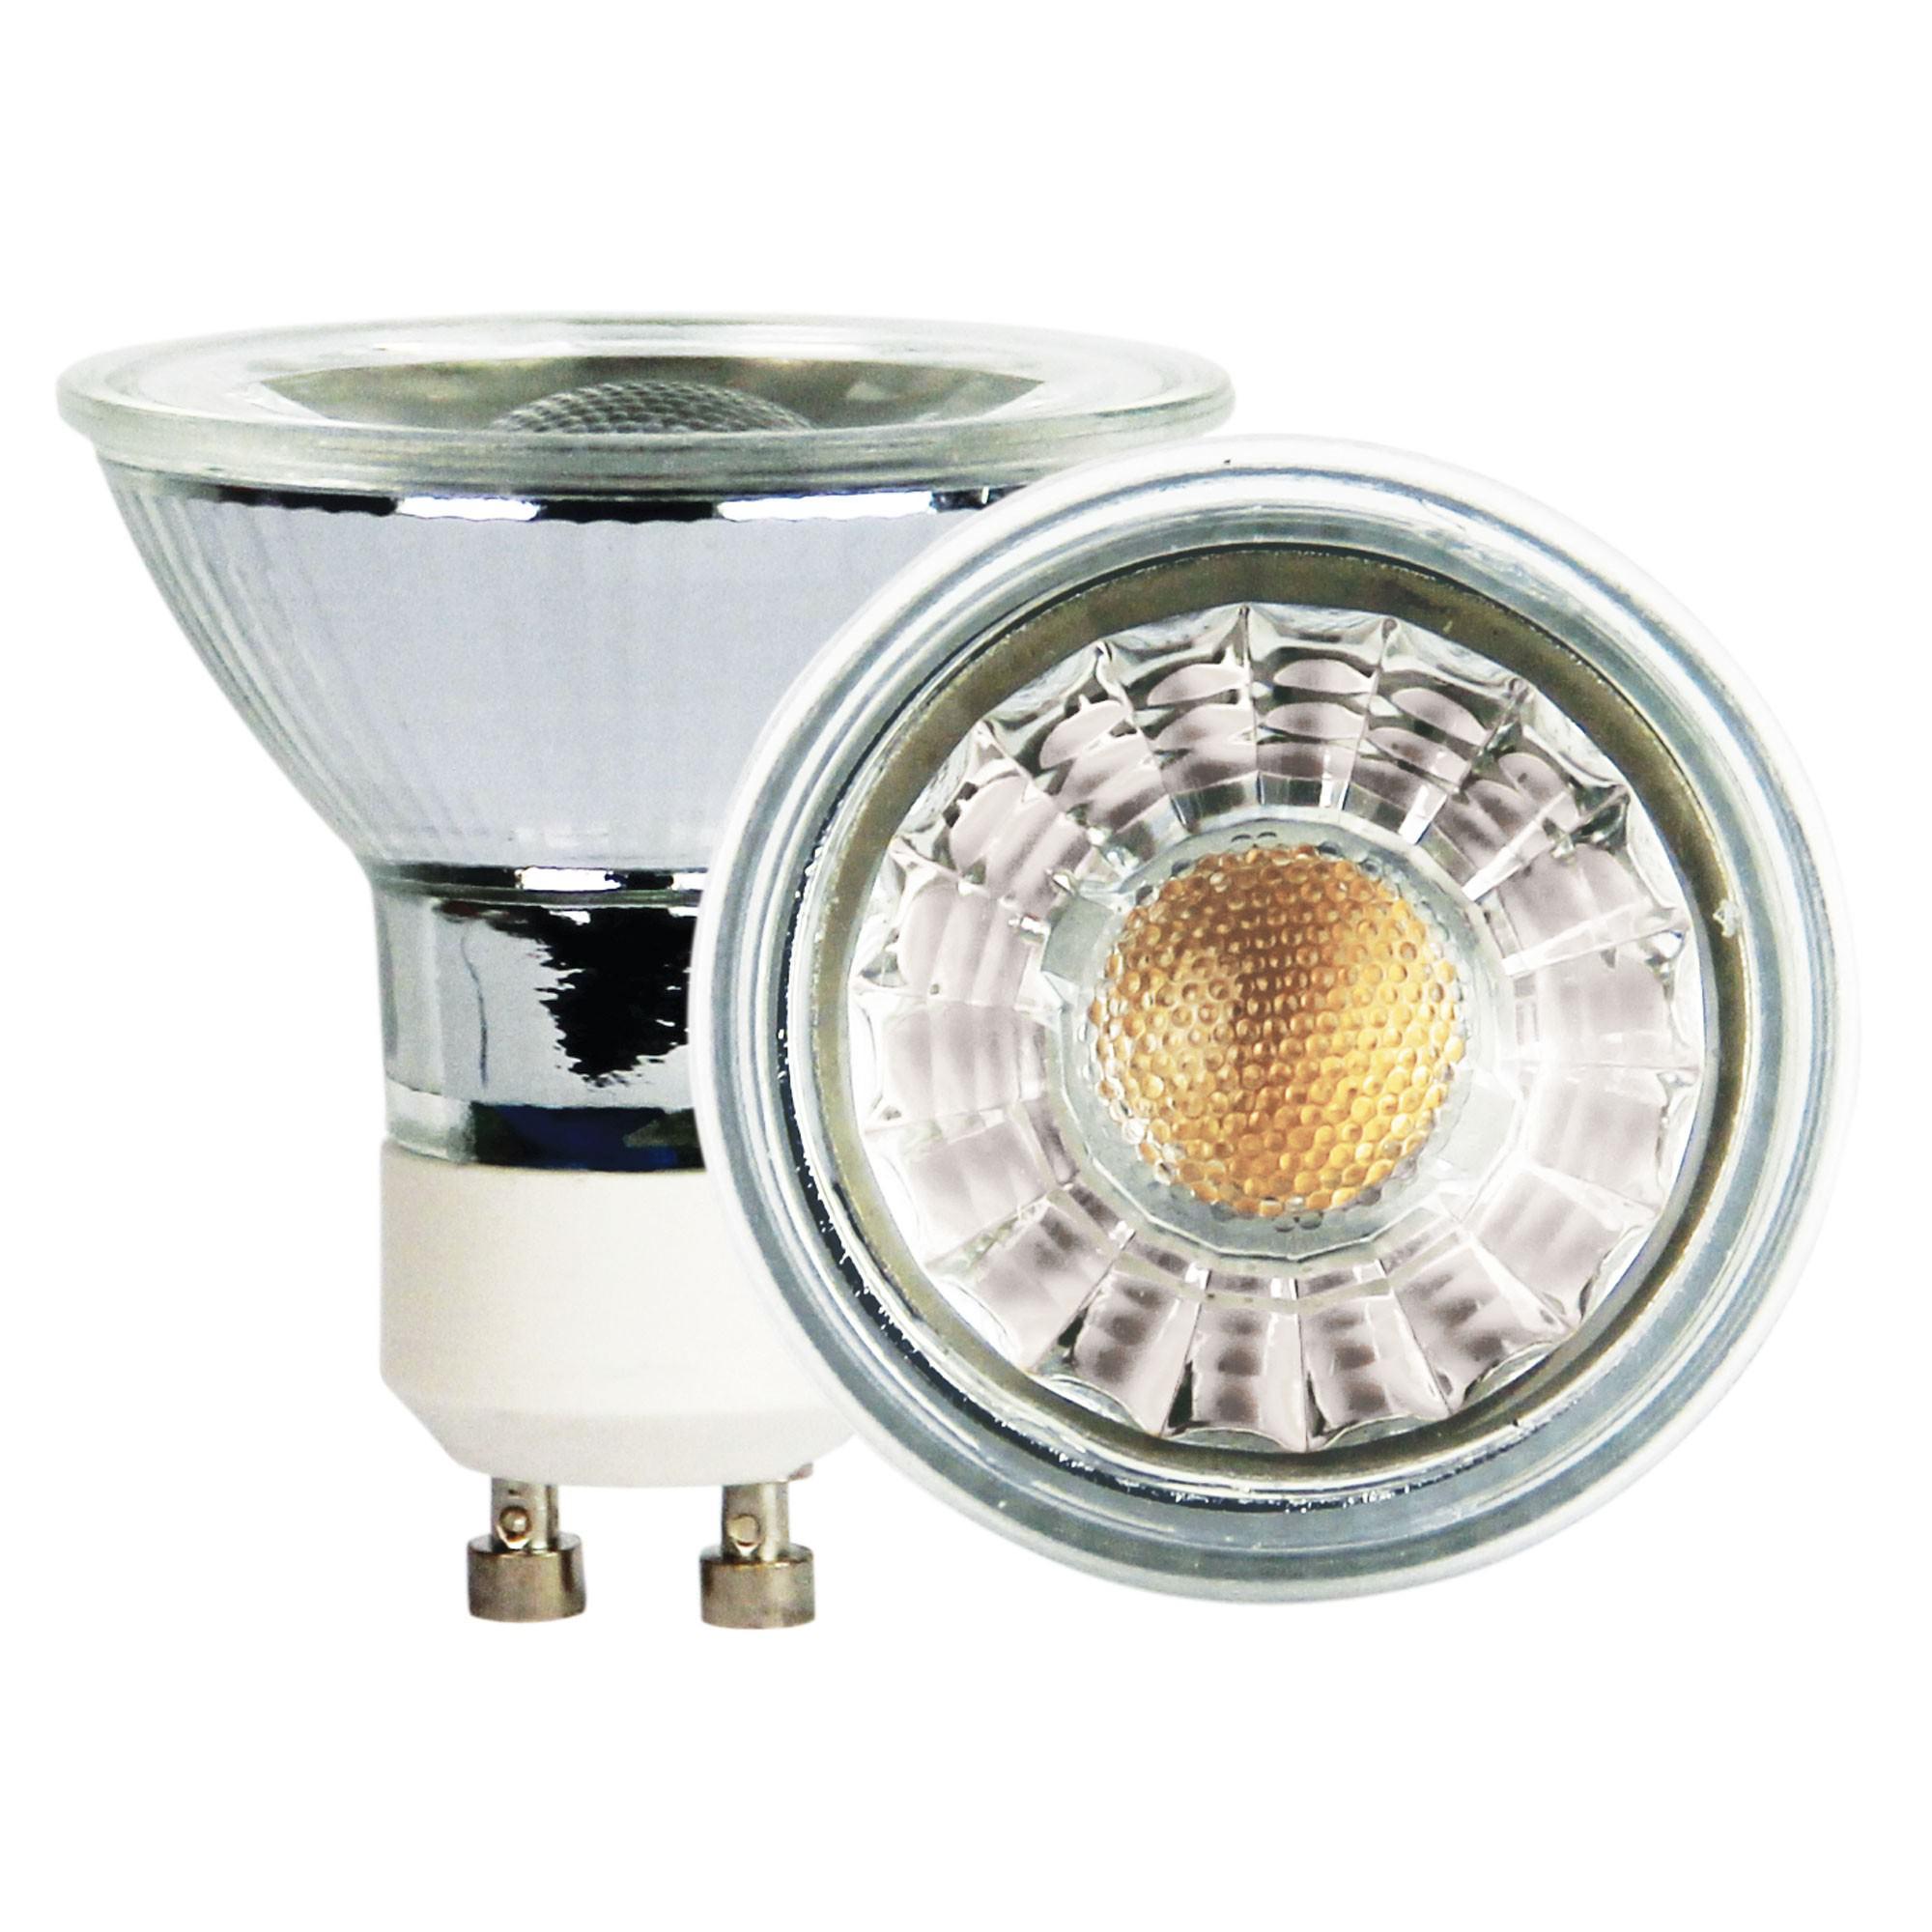 Allume Smart LED Globe, 5W, GU10, 4000K